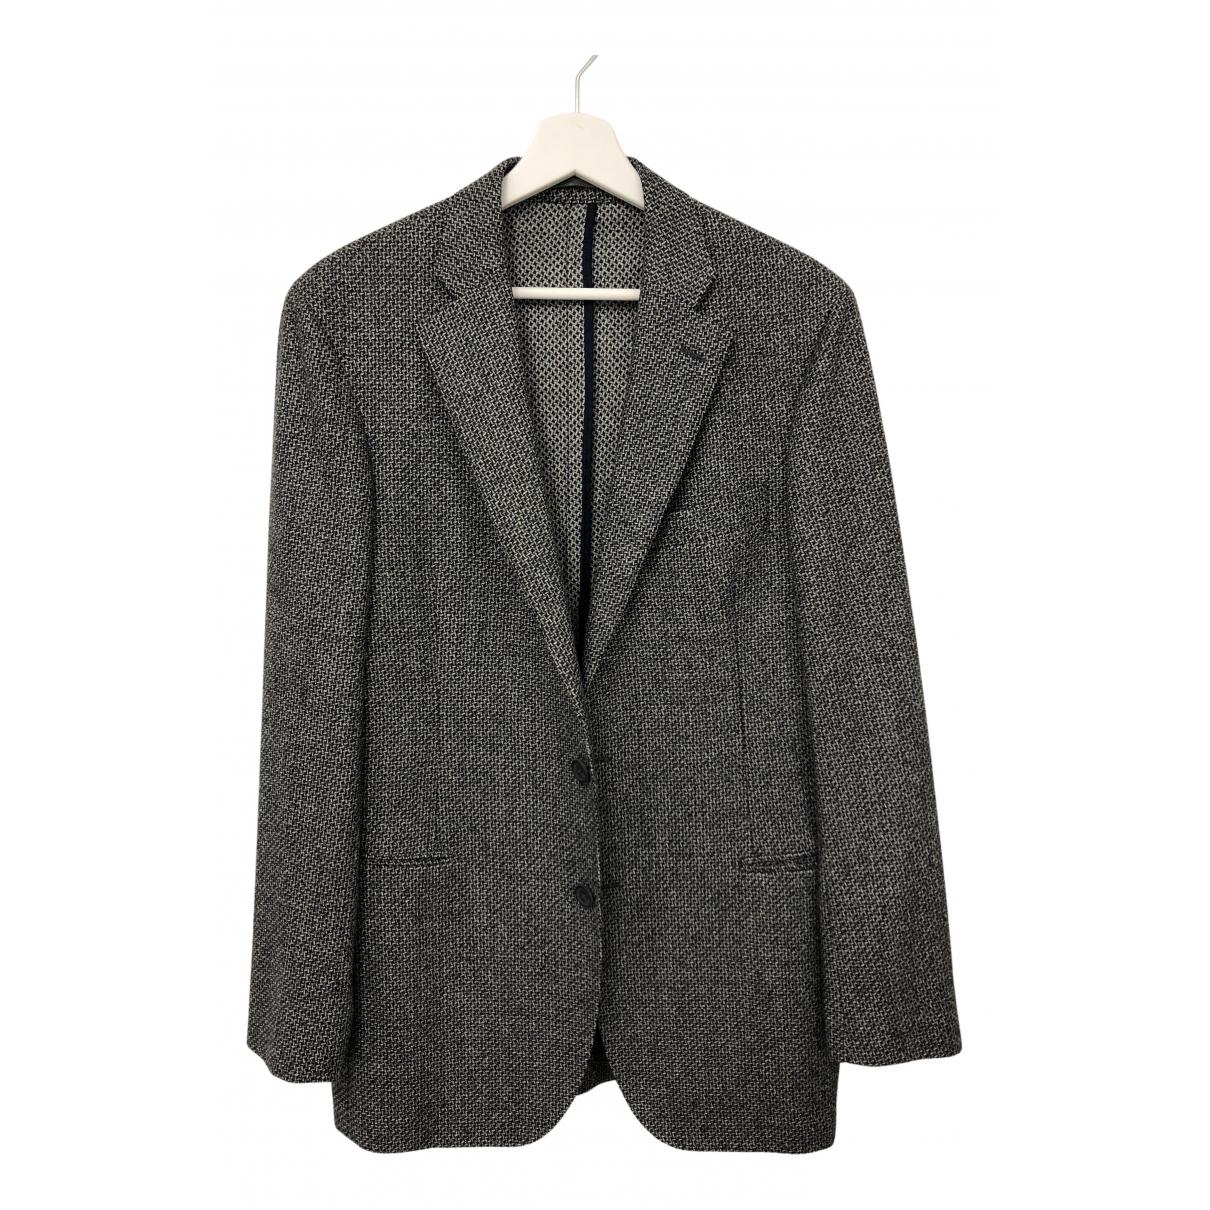 Casely-hayford N Grey Wool jacket  for Men L International